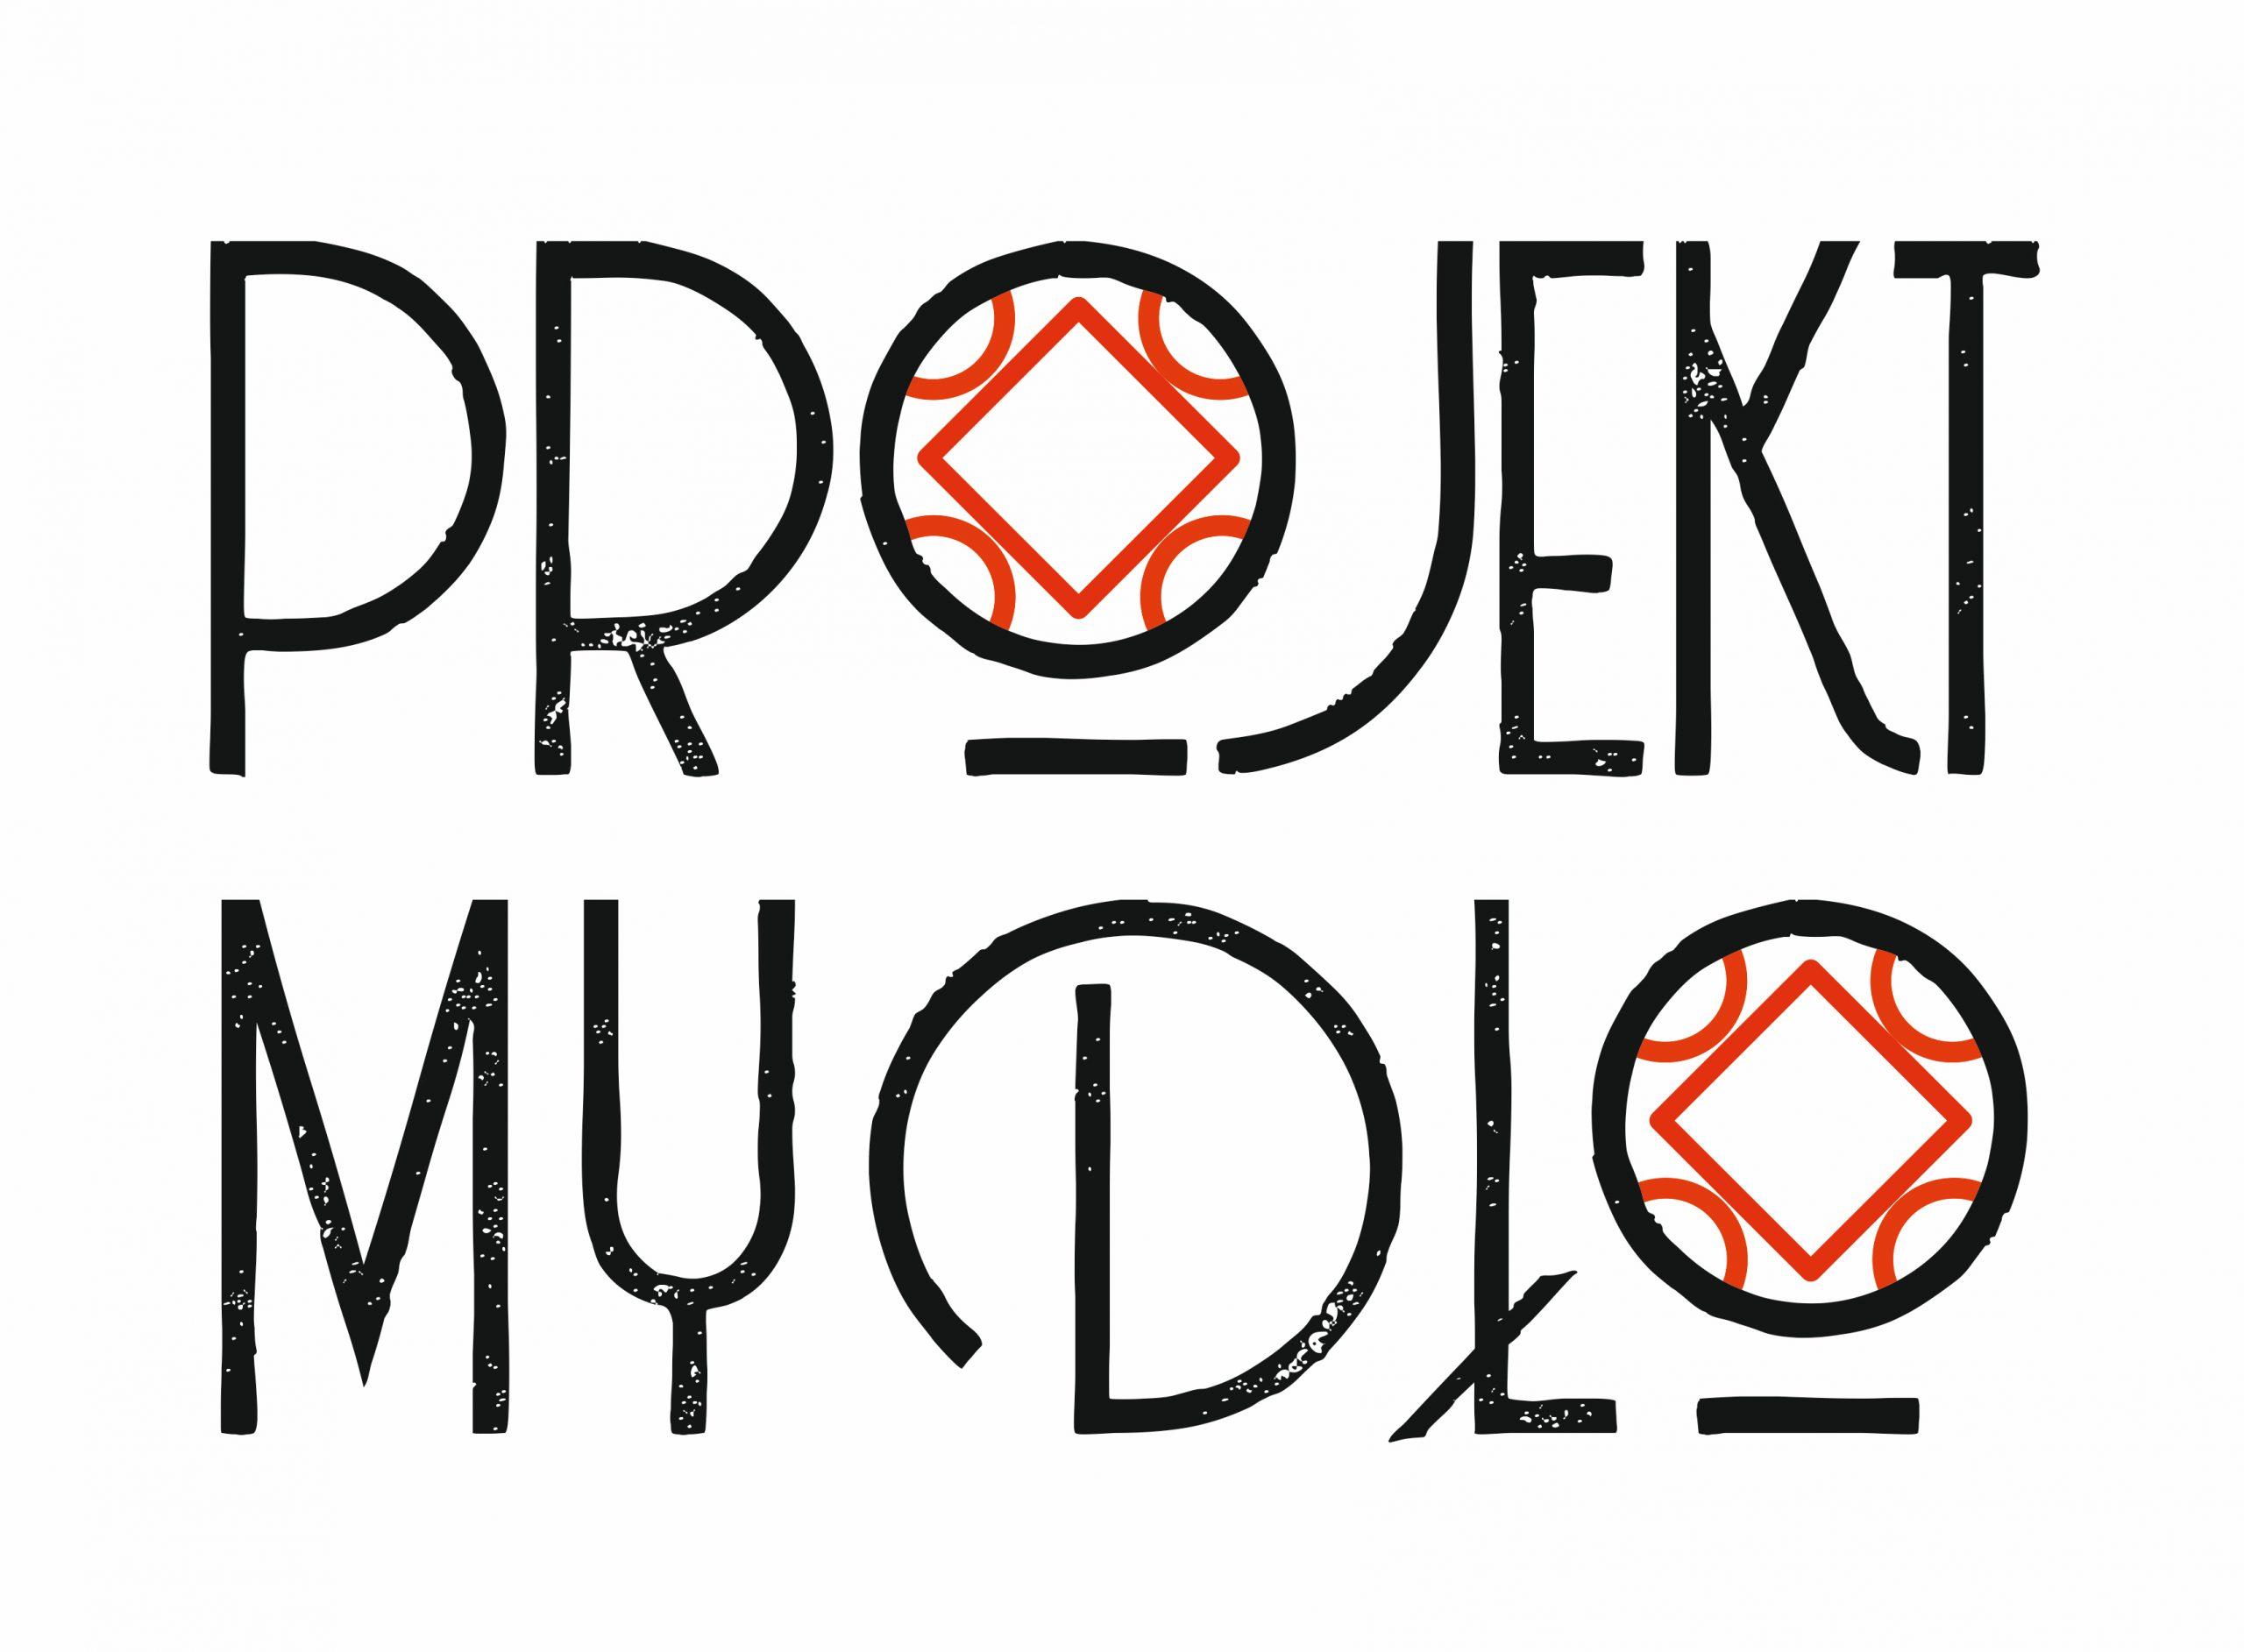 projektmydlo.pl